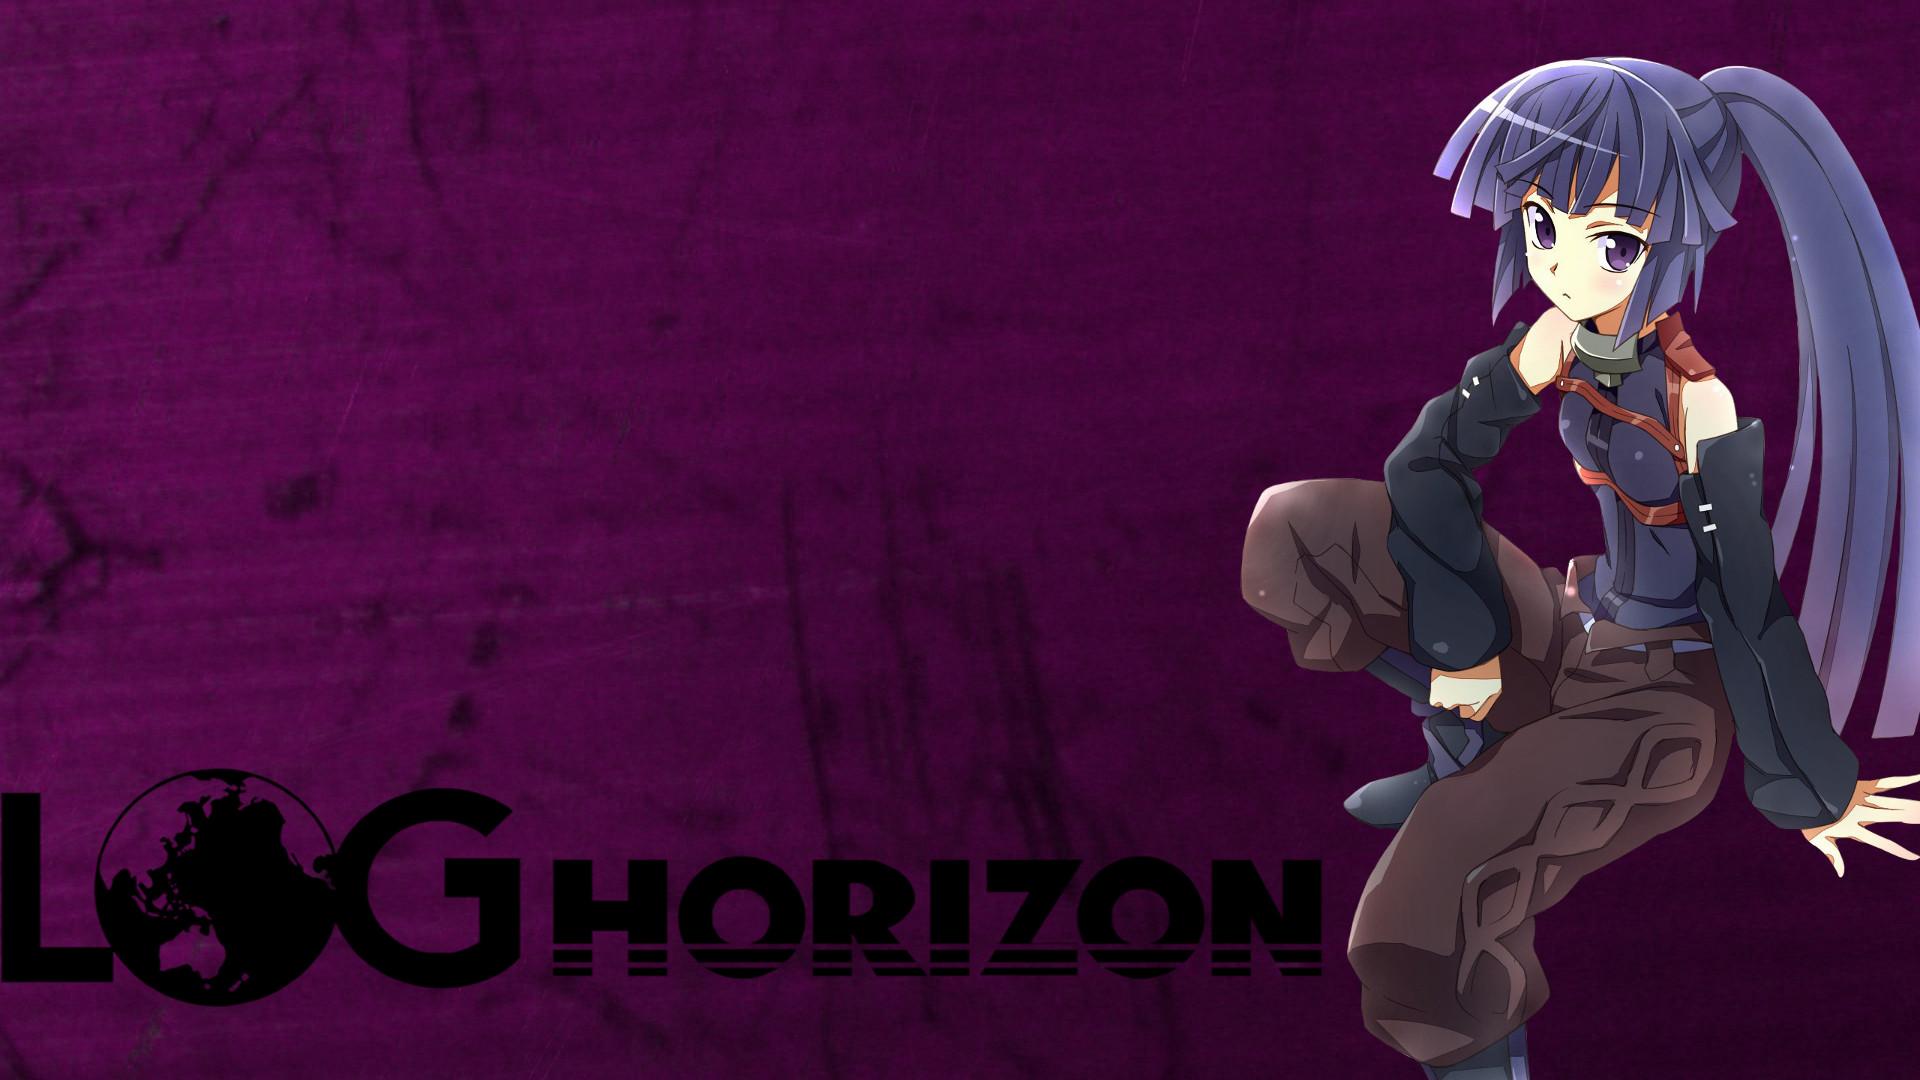 akatsuki log horizon anime girl hd wallpaper 0 HTML code. small 640 x 360  medium 1024 x 576 large 1680 x 945 original 1920 x .